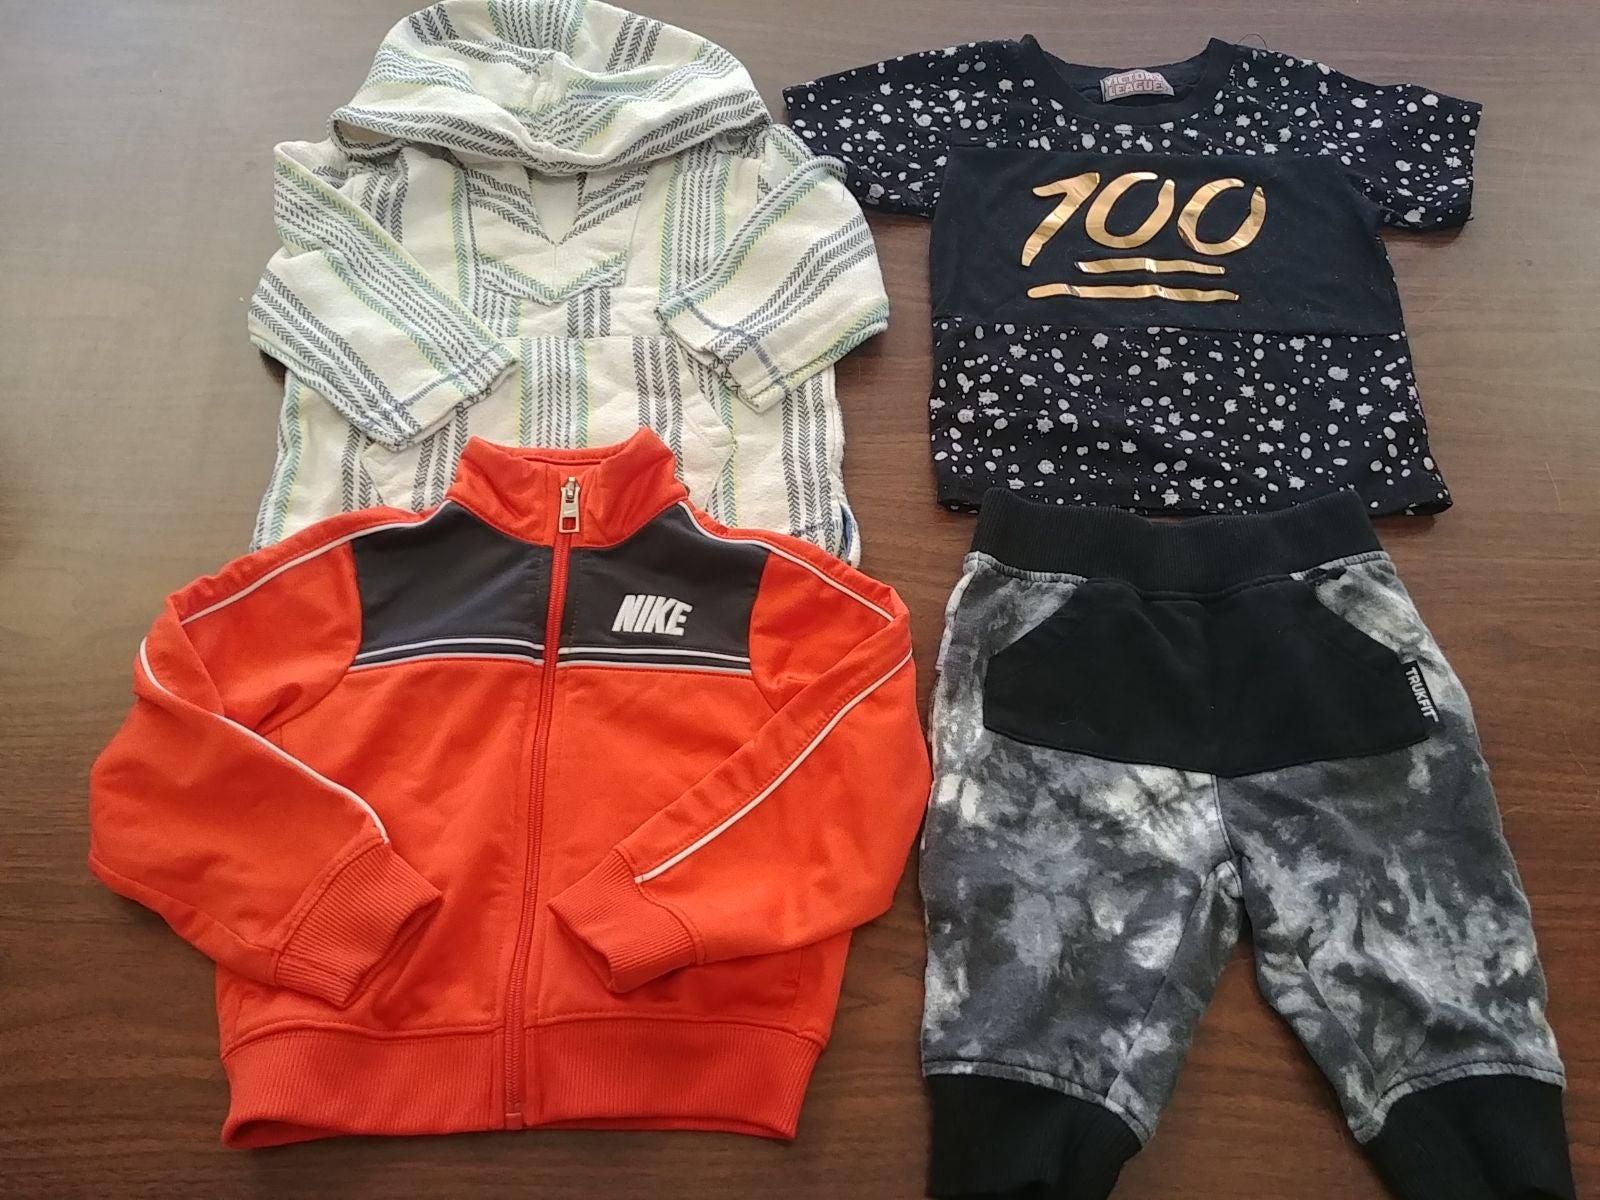 Boys 2T Clothing Lot (w2t3)